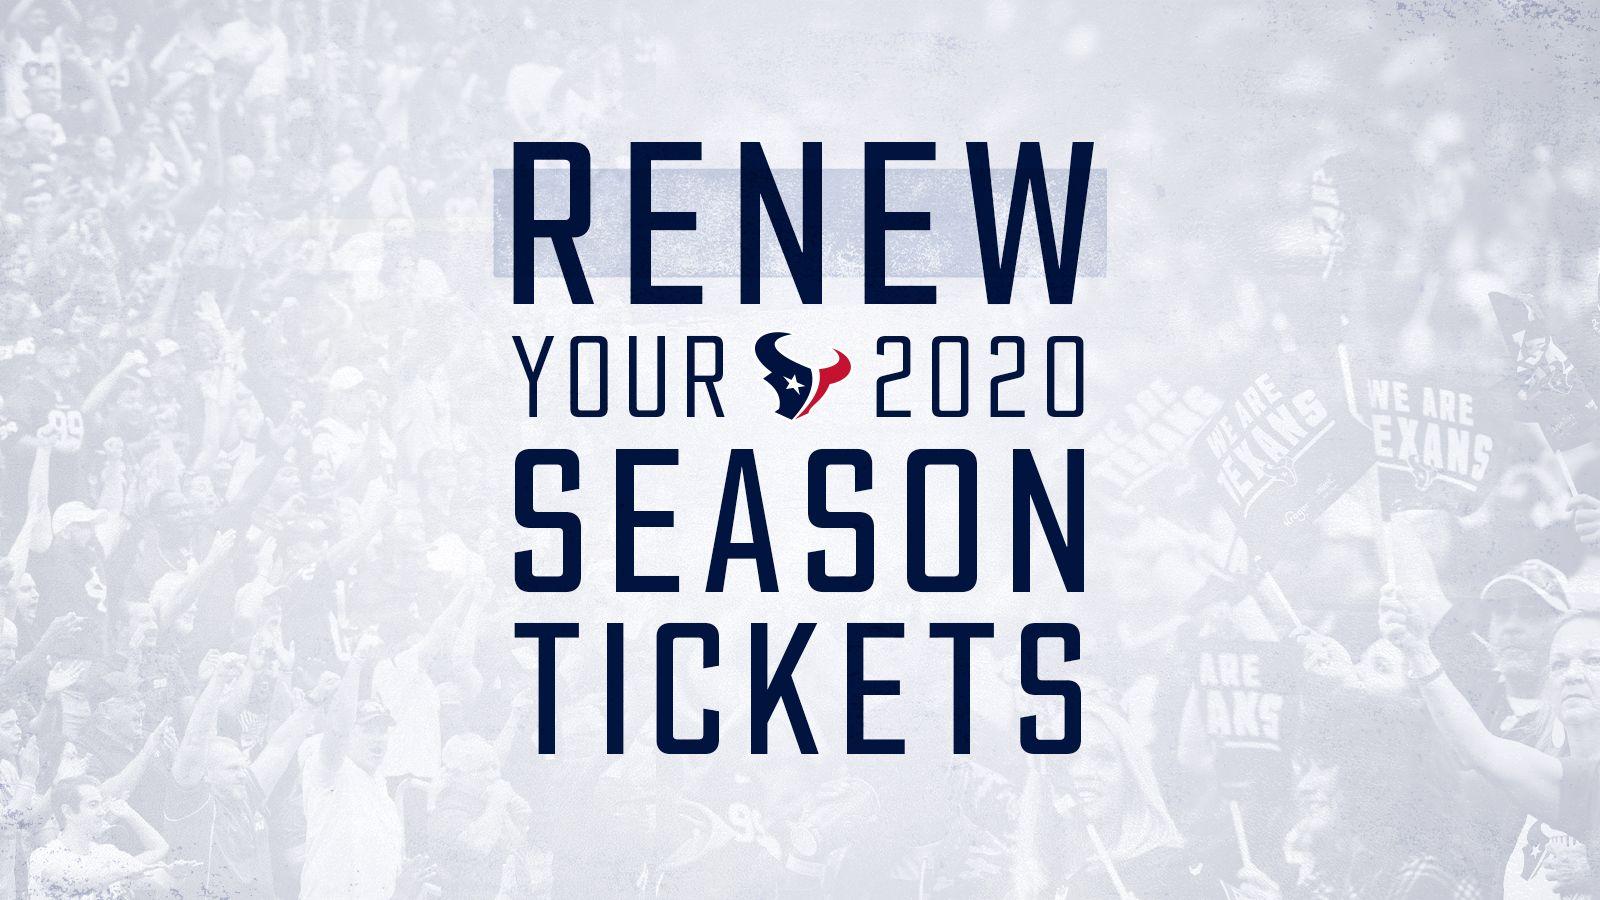 Renew your 2020 Season Tickets